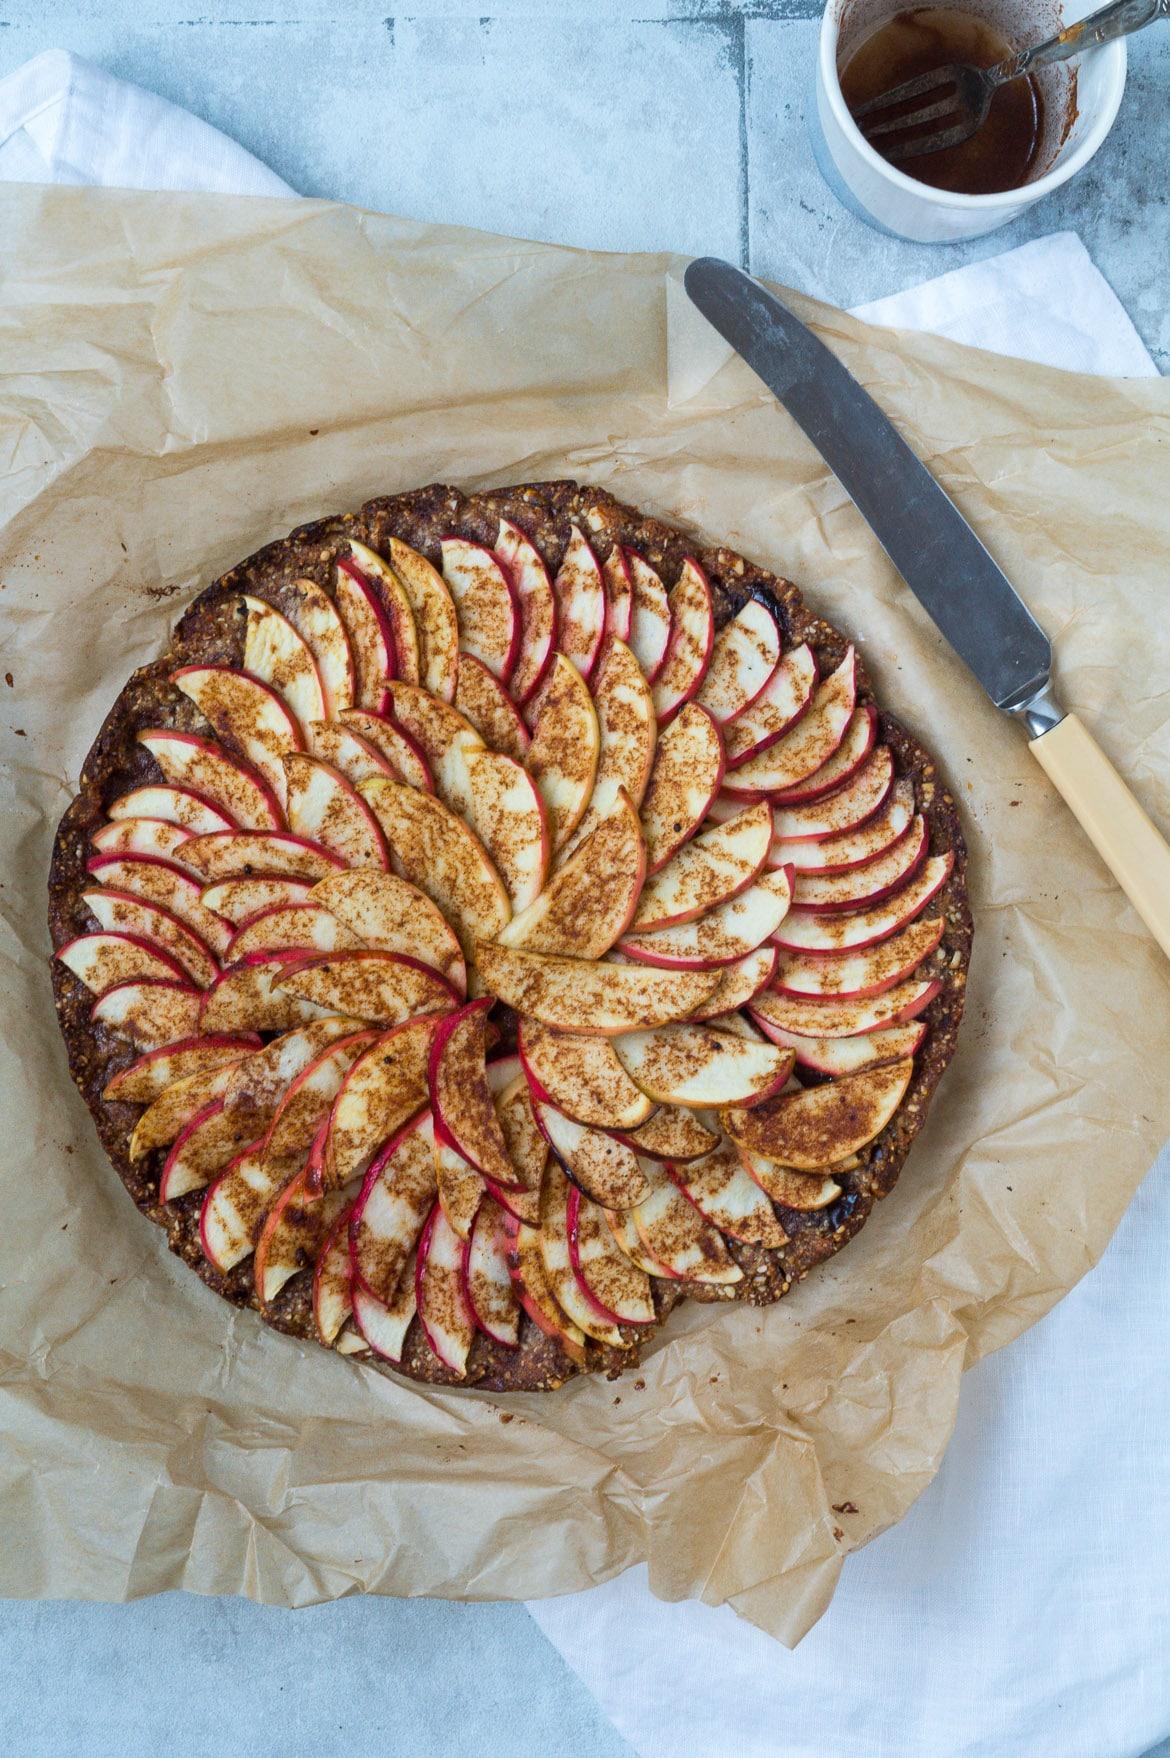 Sundere æbletærte med mandel-peanutbutter bund - Stinna